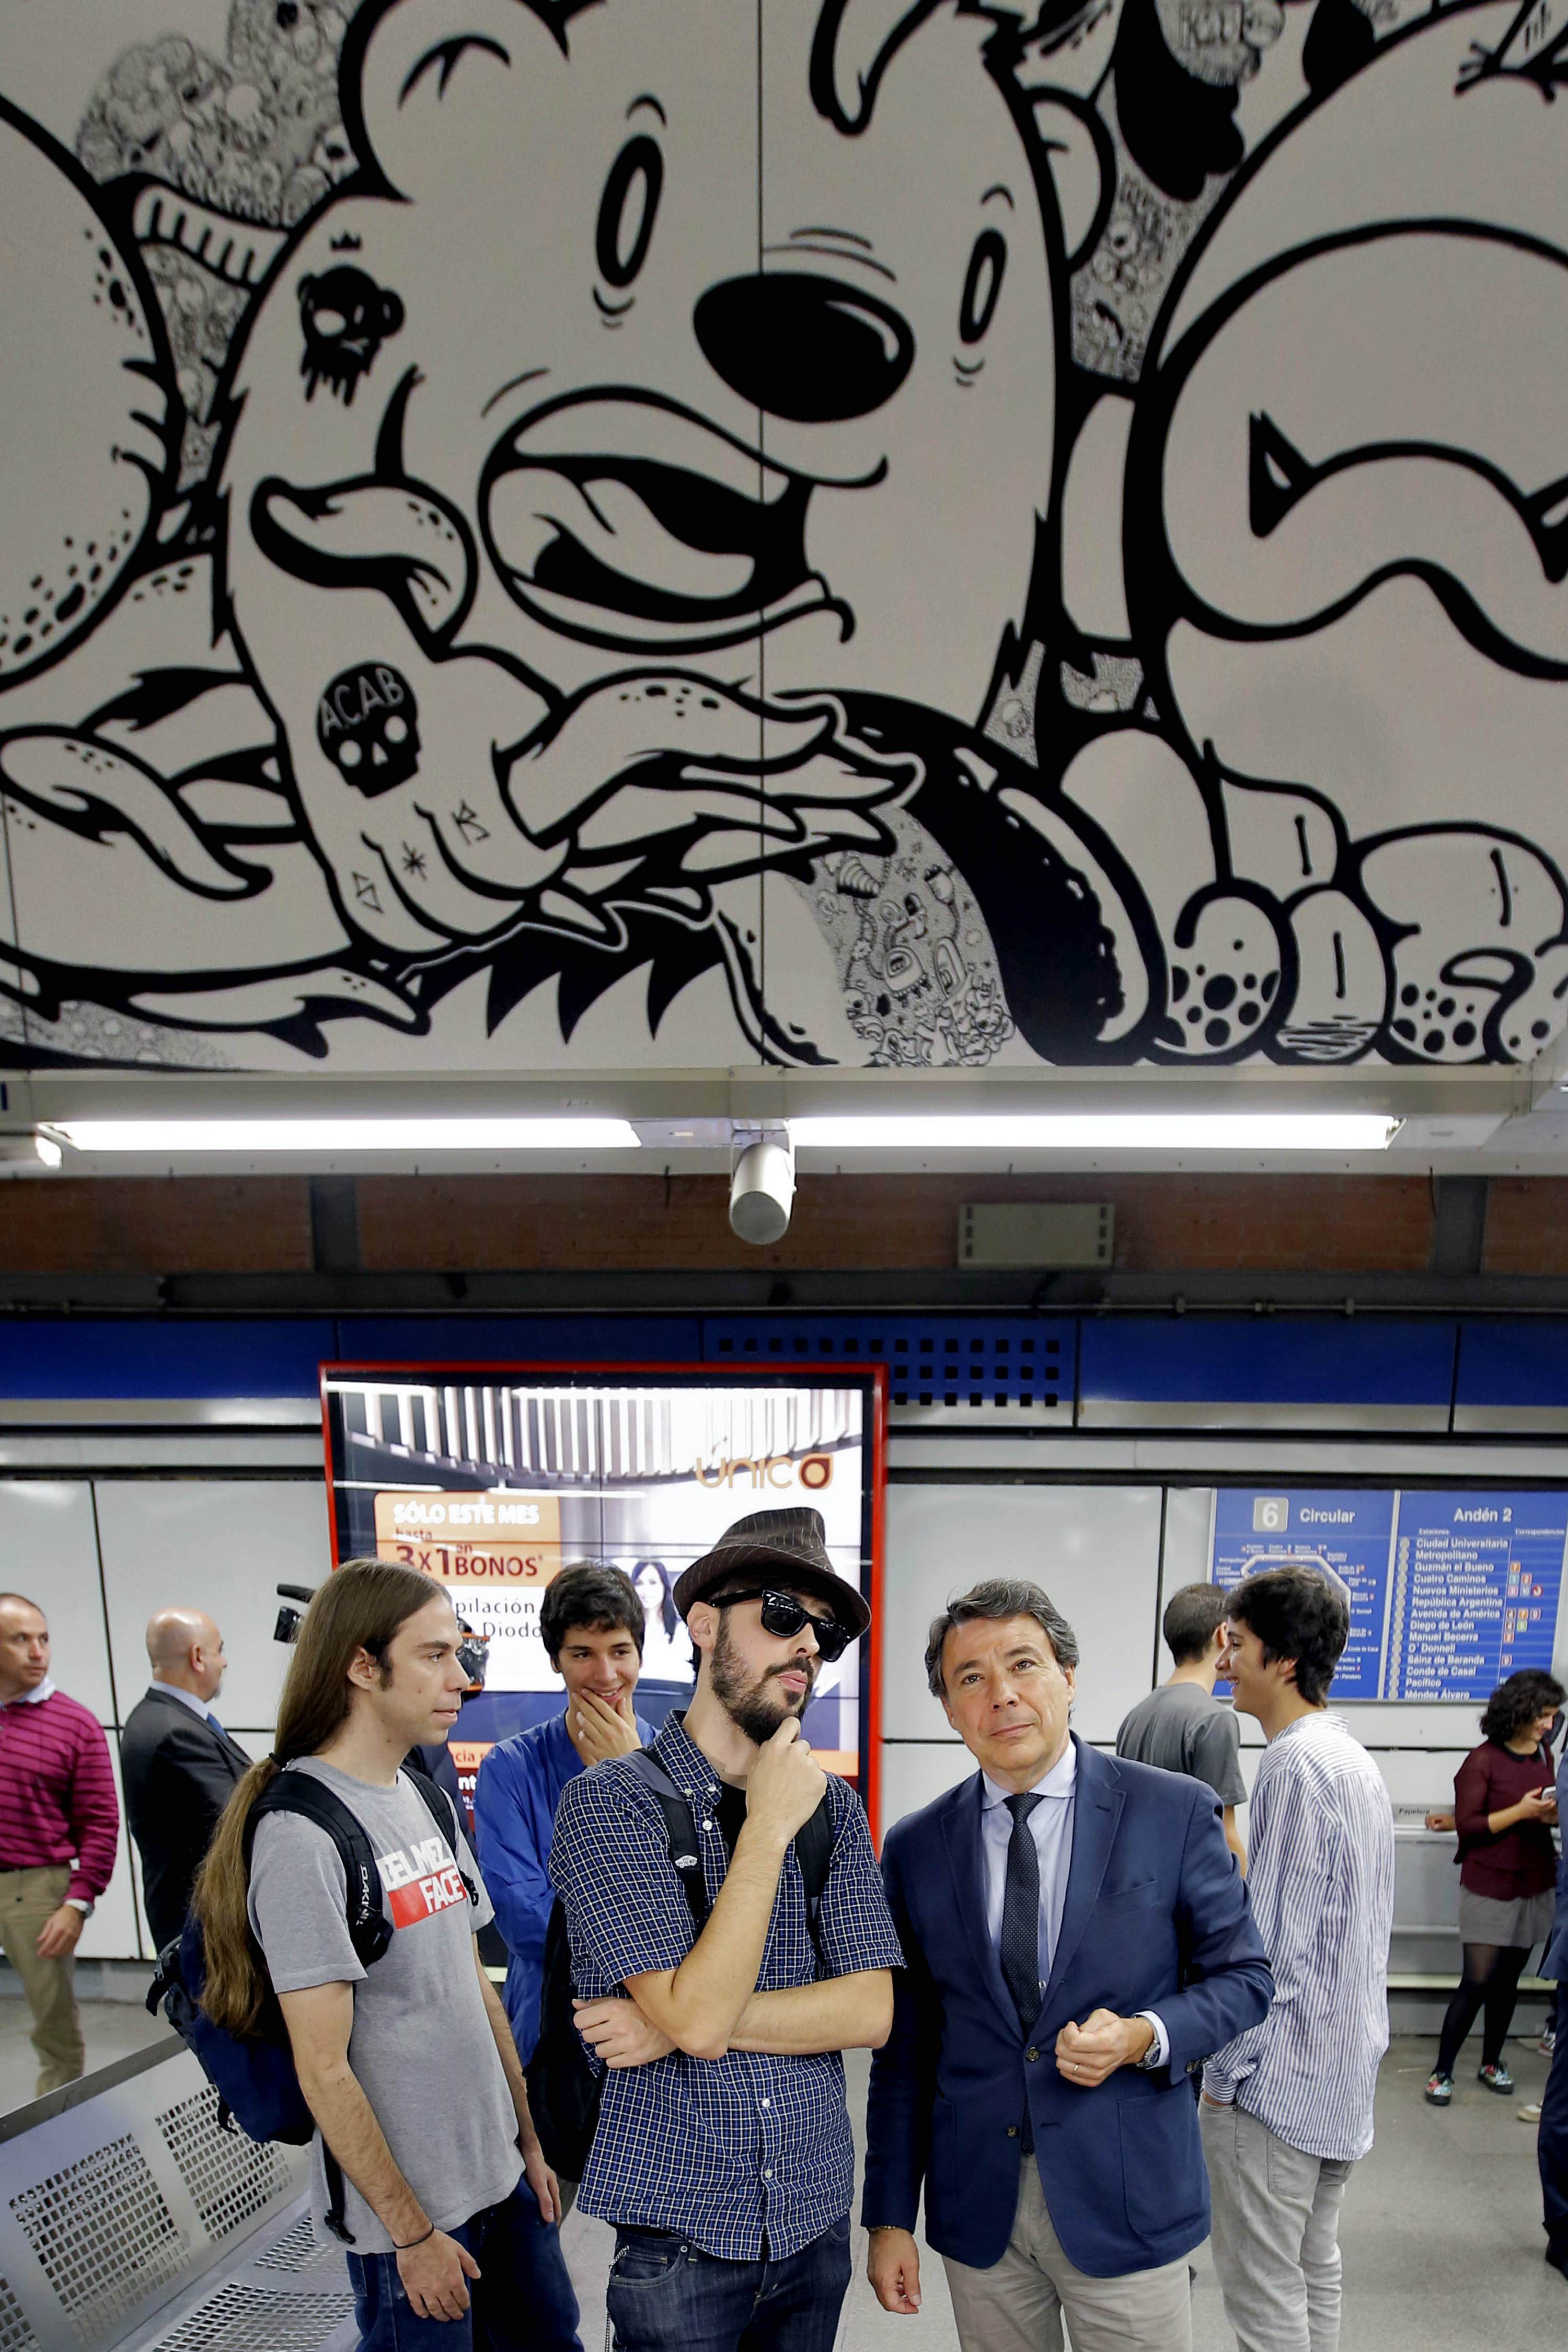 Metro y Metro Ligero de Madrid - Página 5 Satellite?blobcol=urldata&blobheader=image%2Fjpg&blobheadername1=Content-Disposition&blobheadervalue1=filename%3DMetroStreetArt05